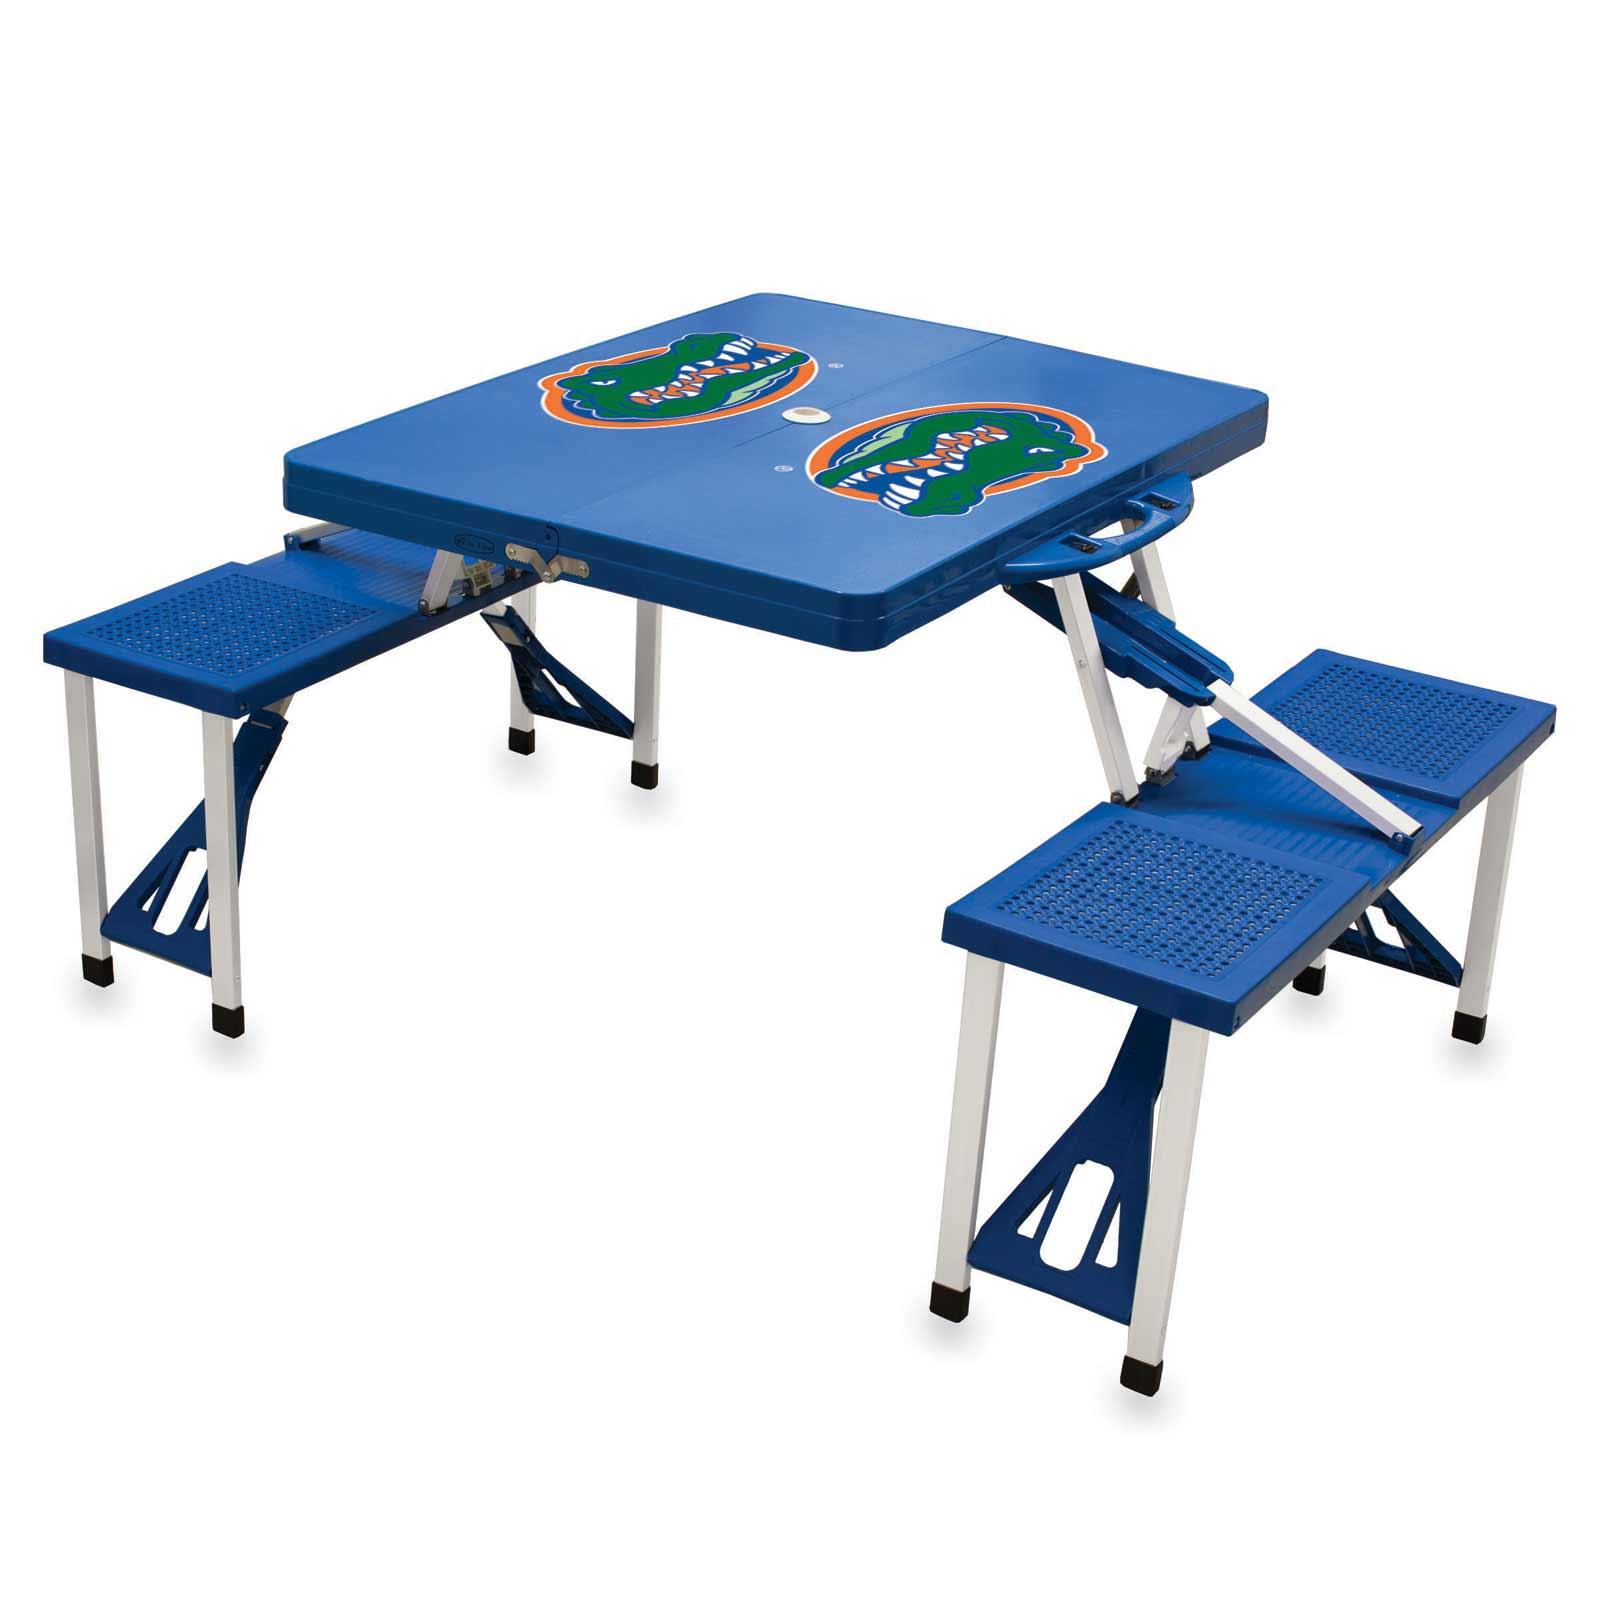 Blue Folding Picnic Table from Florida Gators